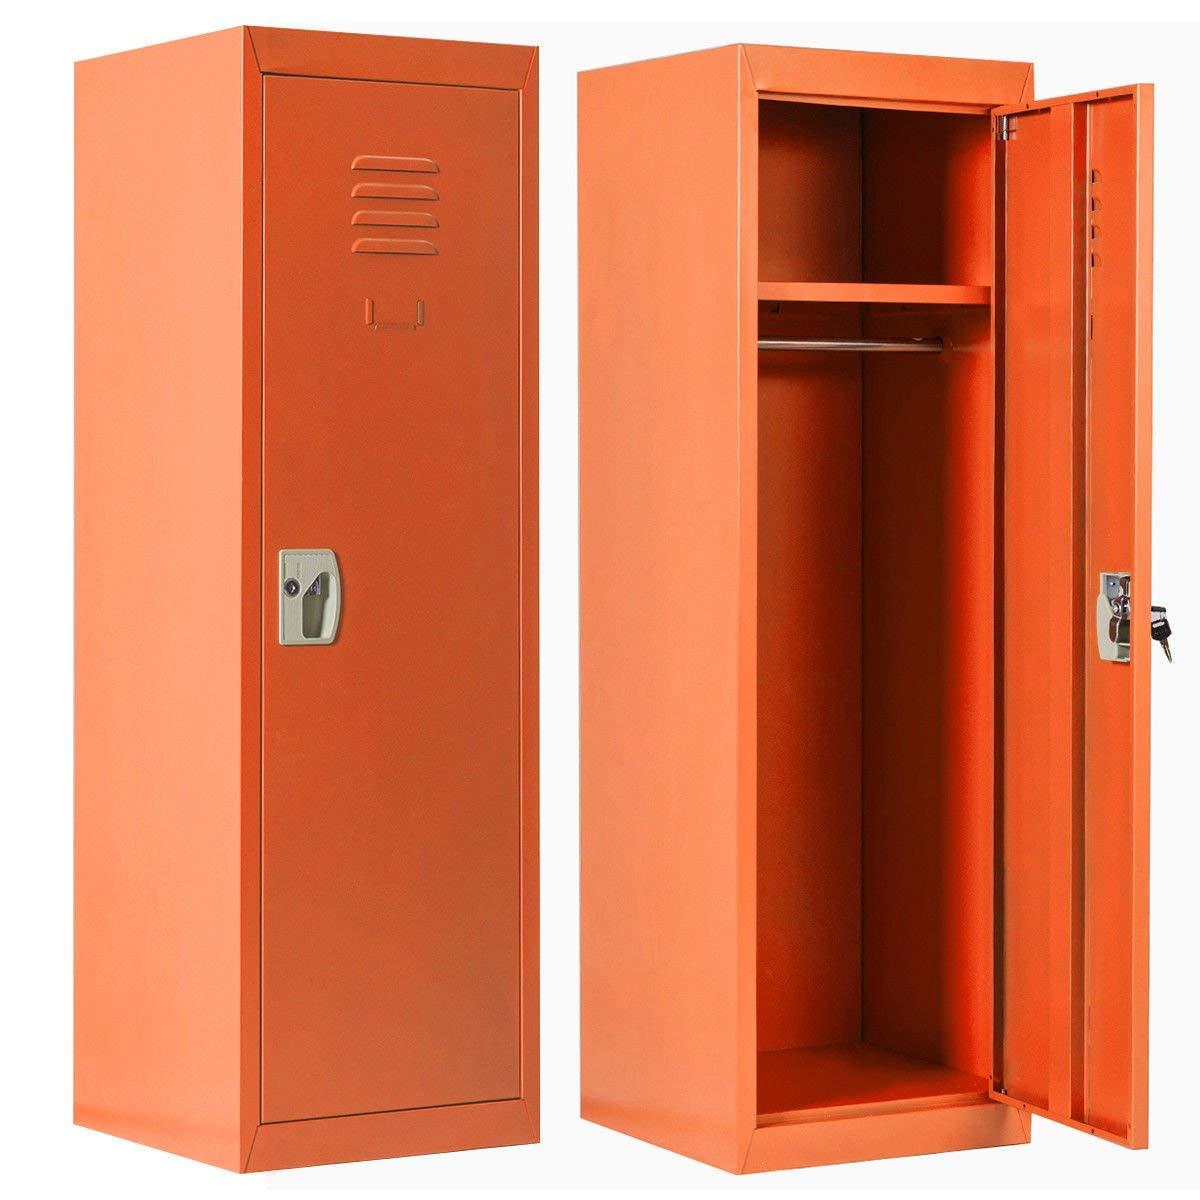 INVIE Kids Storage Metal Locker Single Tier Metal Locker for Home & School - with Key & Hanging Rods Orange …